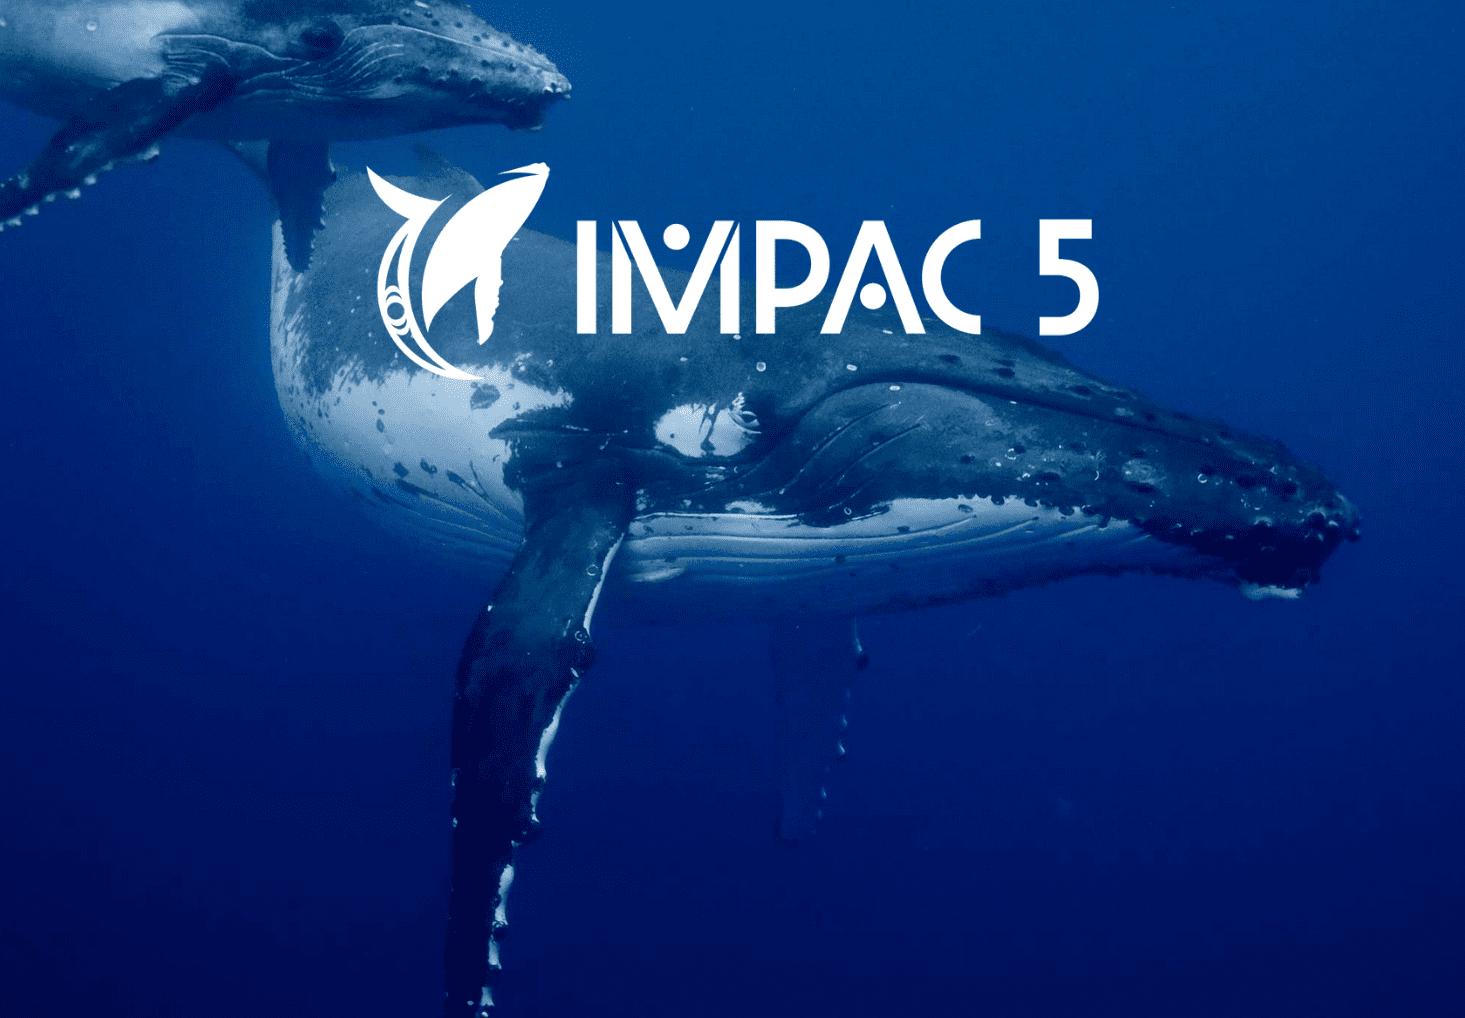 Fifth International Marine Protected Areas Congress (IMPAC5)